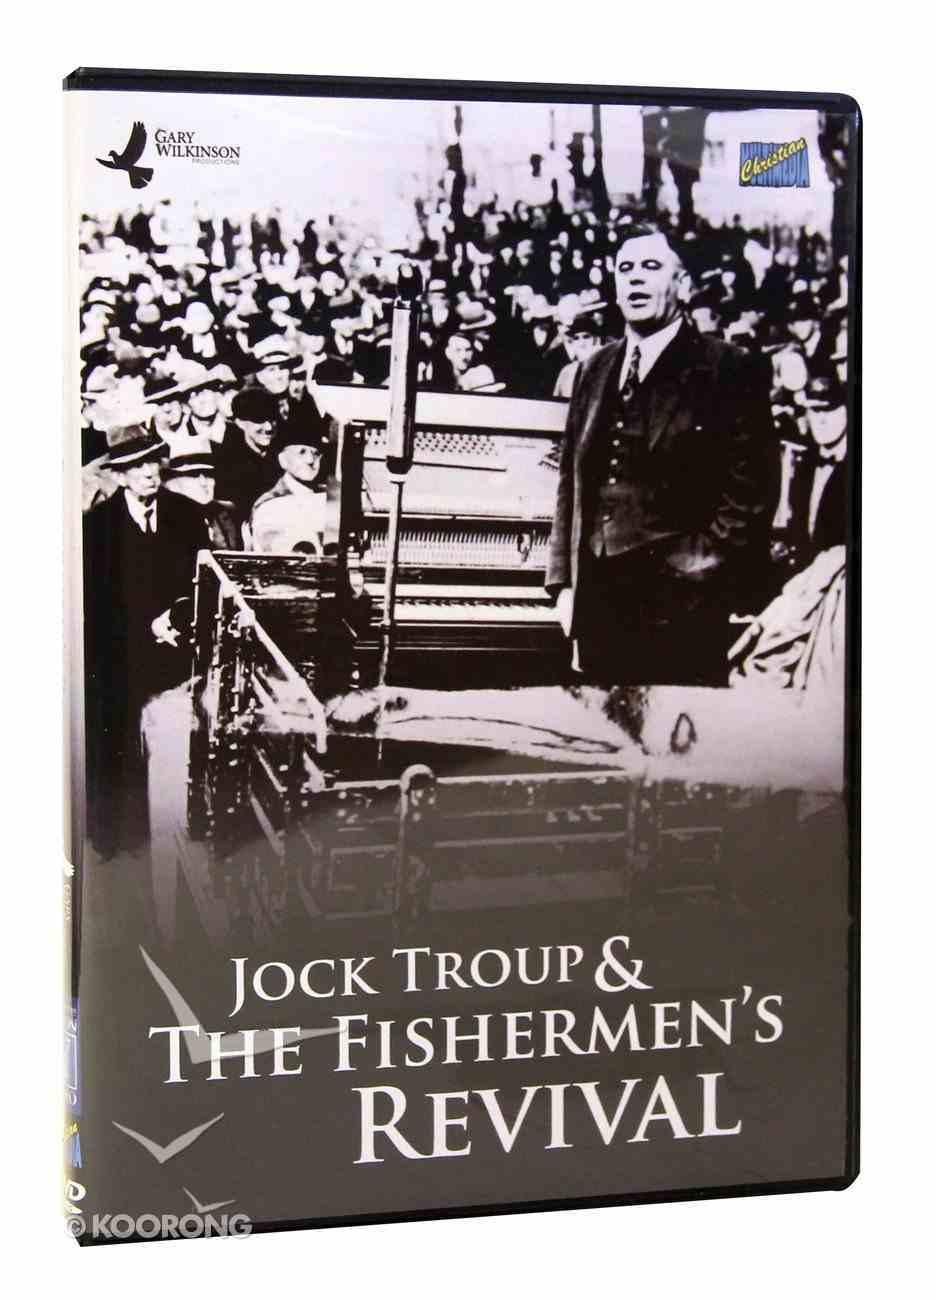 Jock Troup & the Fisherman's Revival (48 Mins) DVD